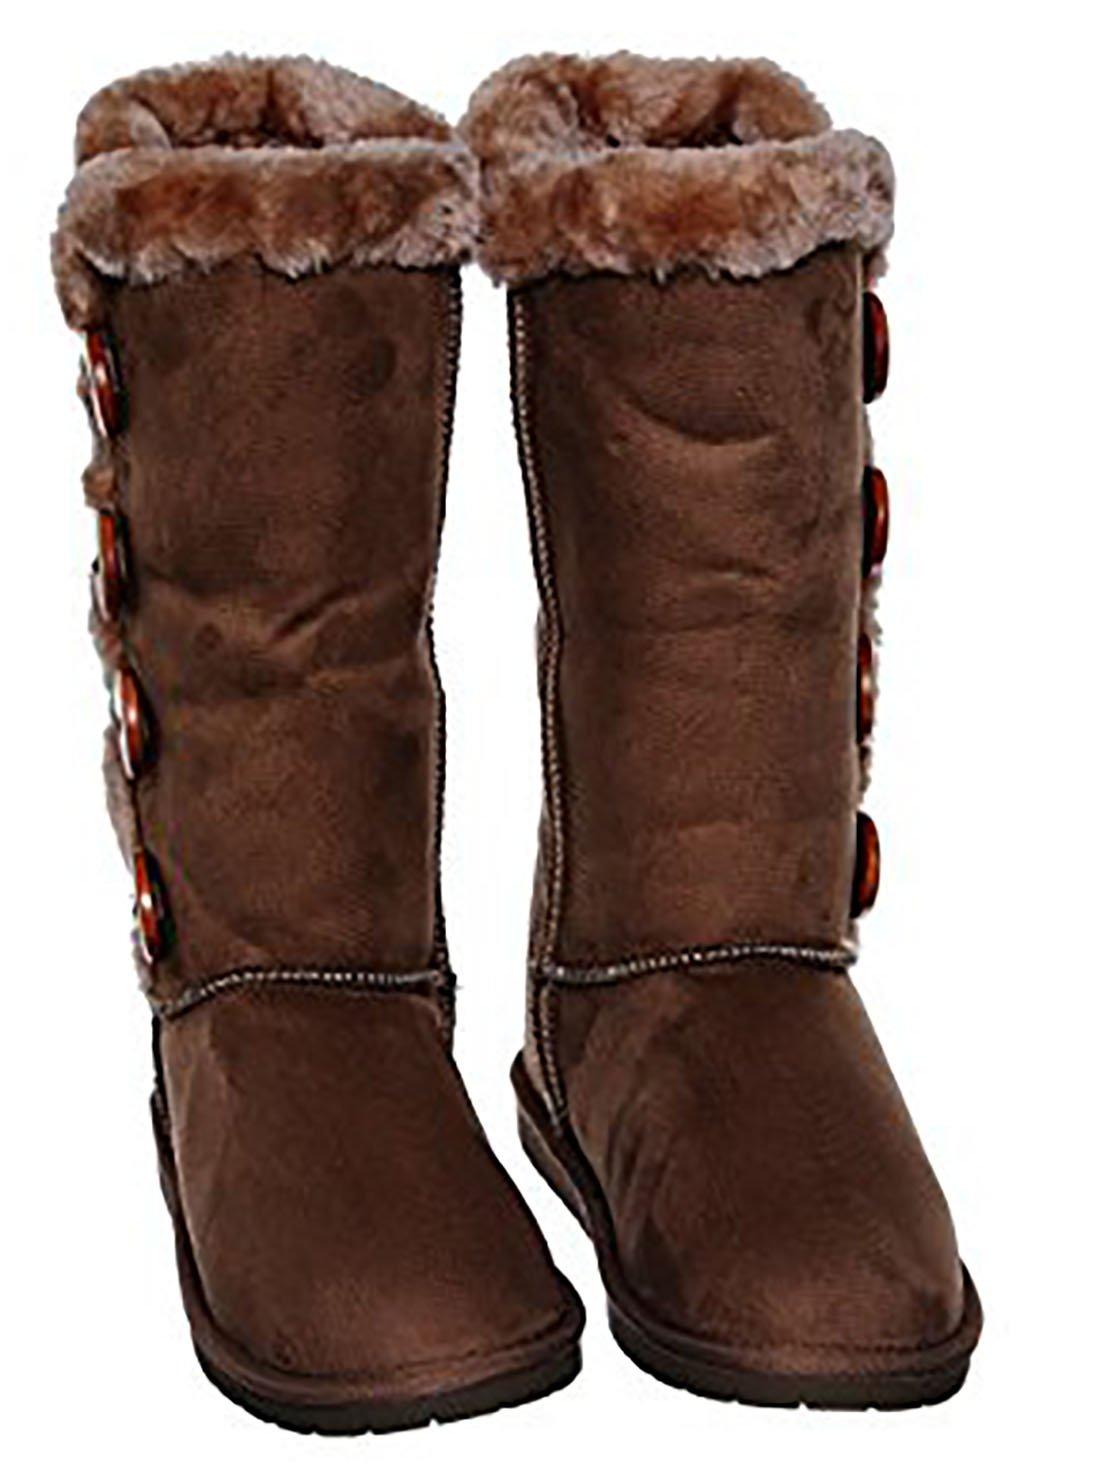 0da1141ff Forever Link color liso con cuatro botones de piel forrada Botas de nieve  de media caña Zapatos MVE castaña